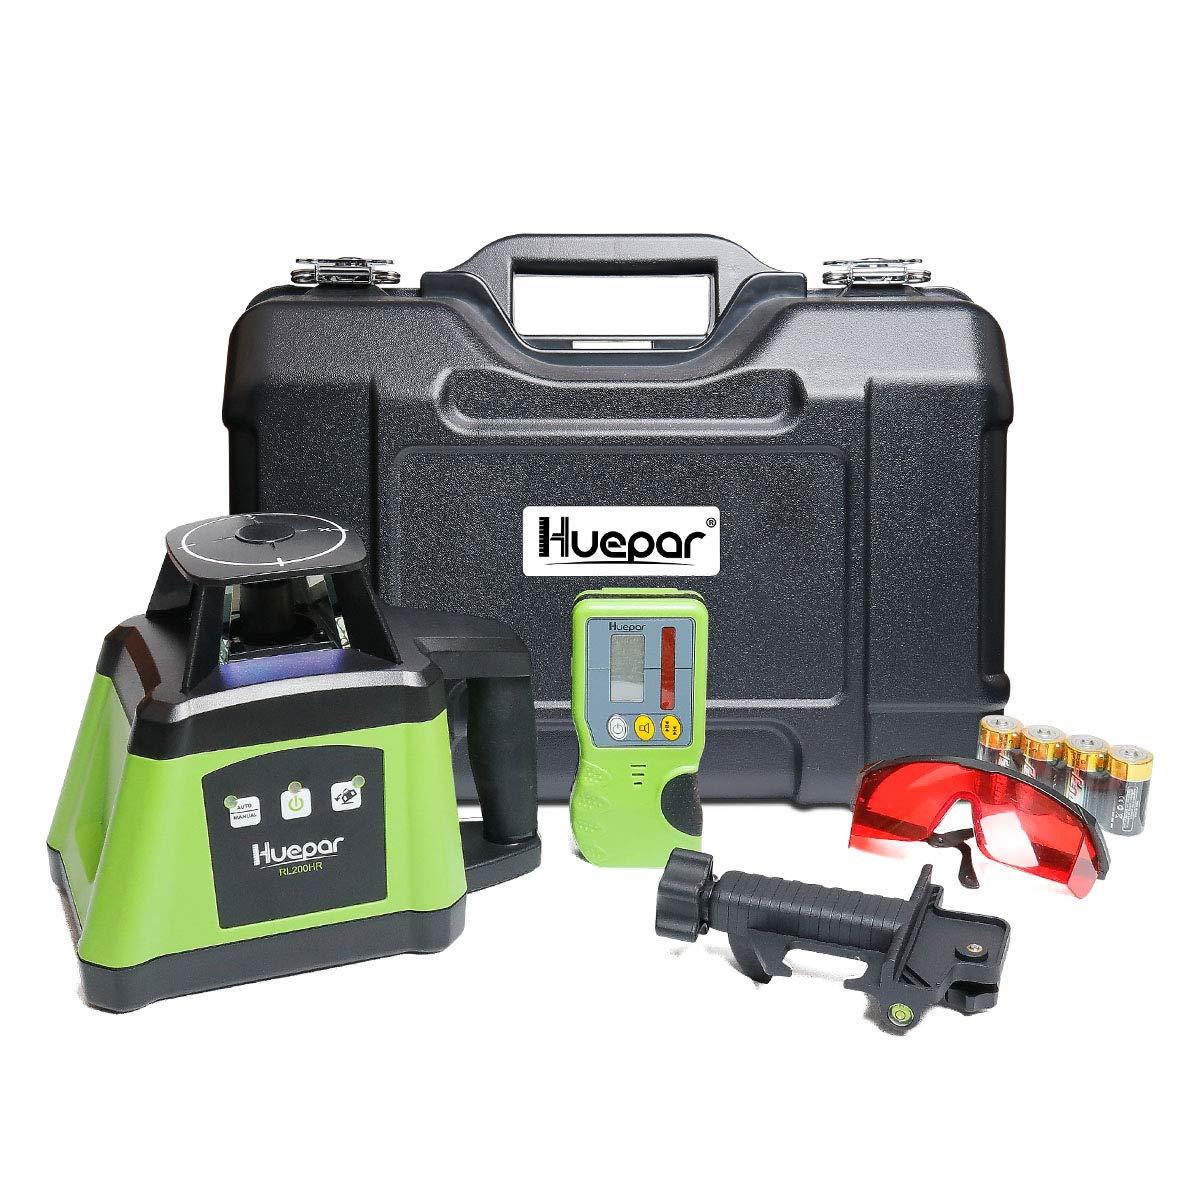 Huepar Electronic Self-Leveling Rotary Laser Level Kit -360 Horizontal Laser Beam Interior/Exterior Rotating Laser Level Tool, Receiver, Protective Glasses, Alkaline Battery, Hard Case Kit RL200HR